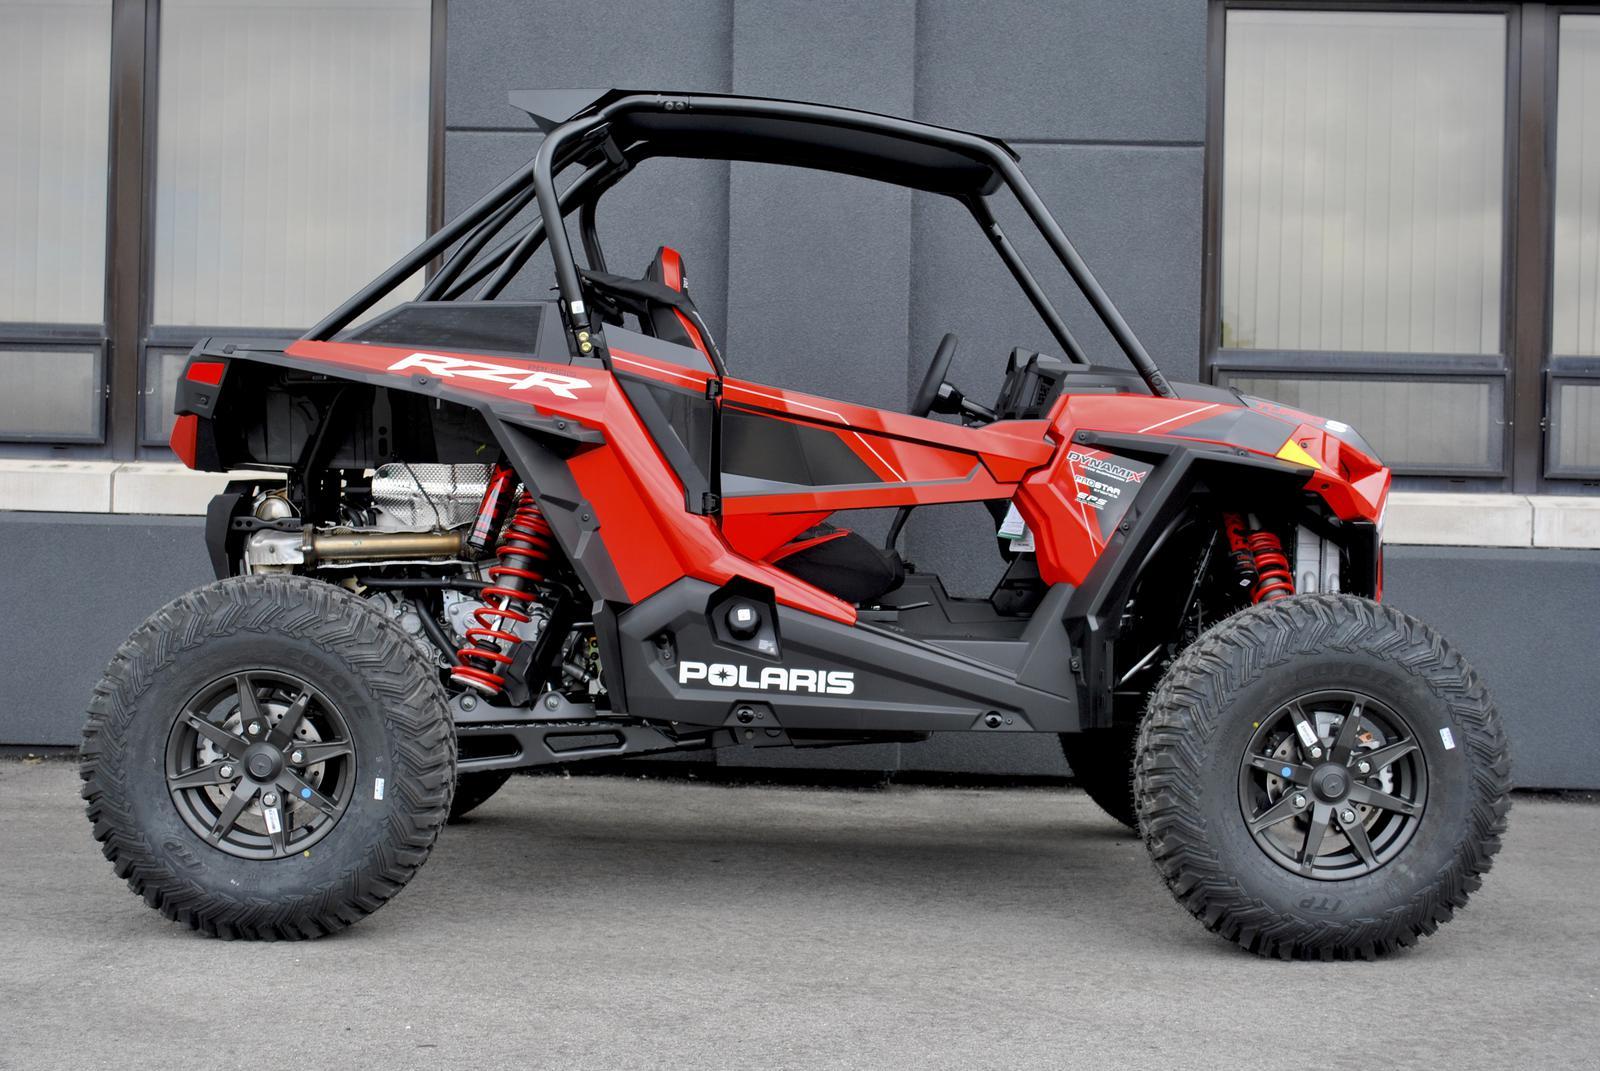 2018 Polaris Industries RZR TURBO S-DX - Z18VEL92BR for sale